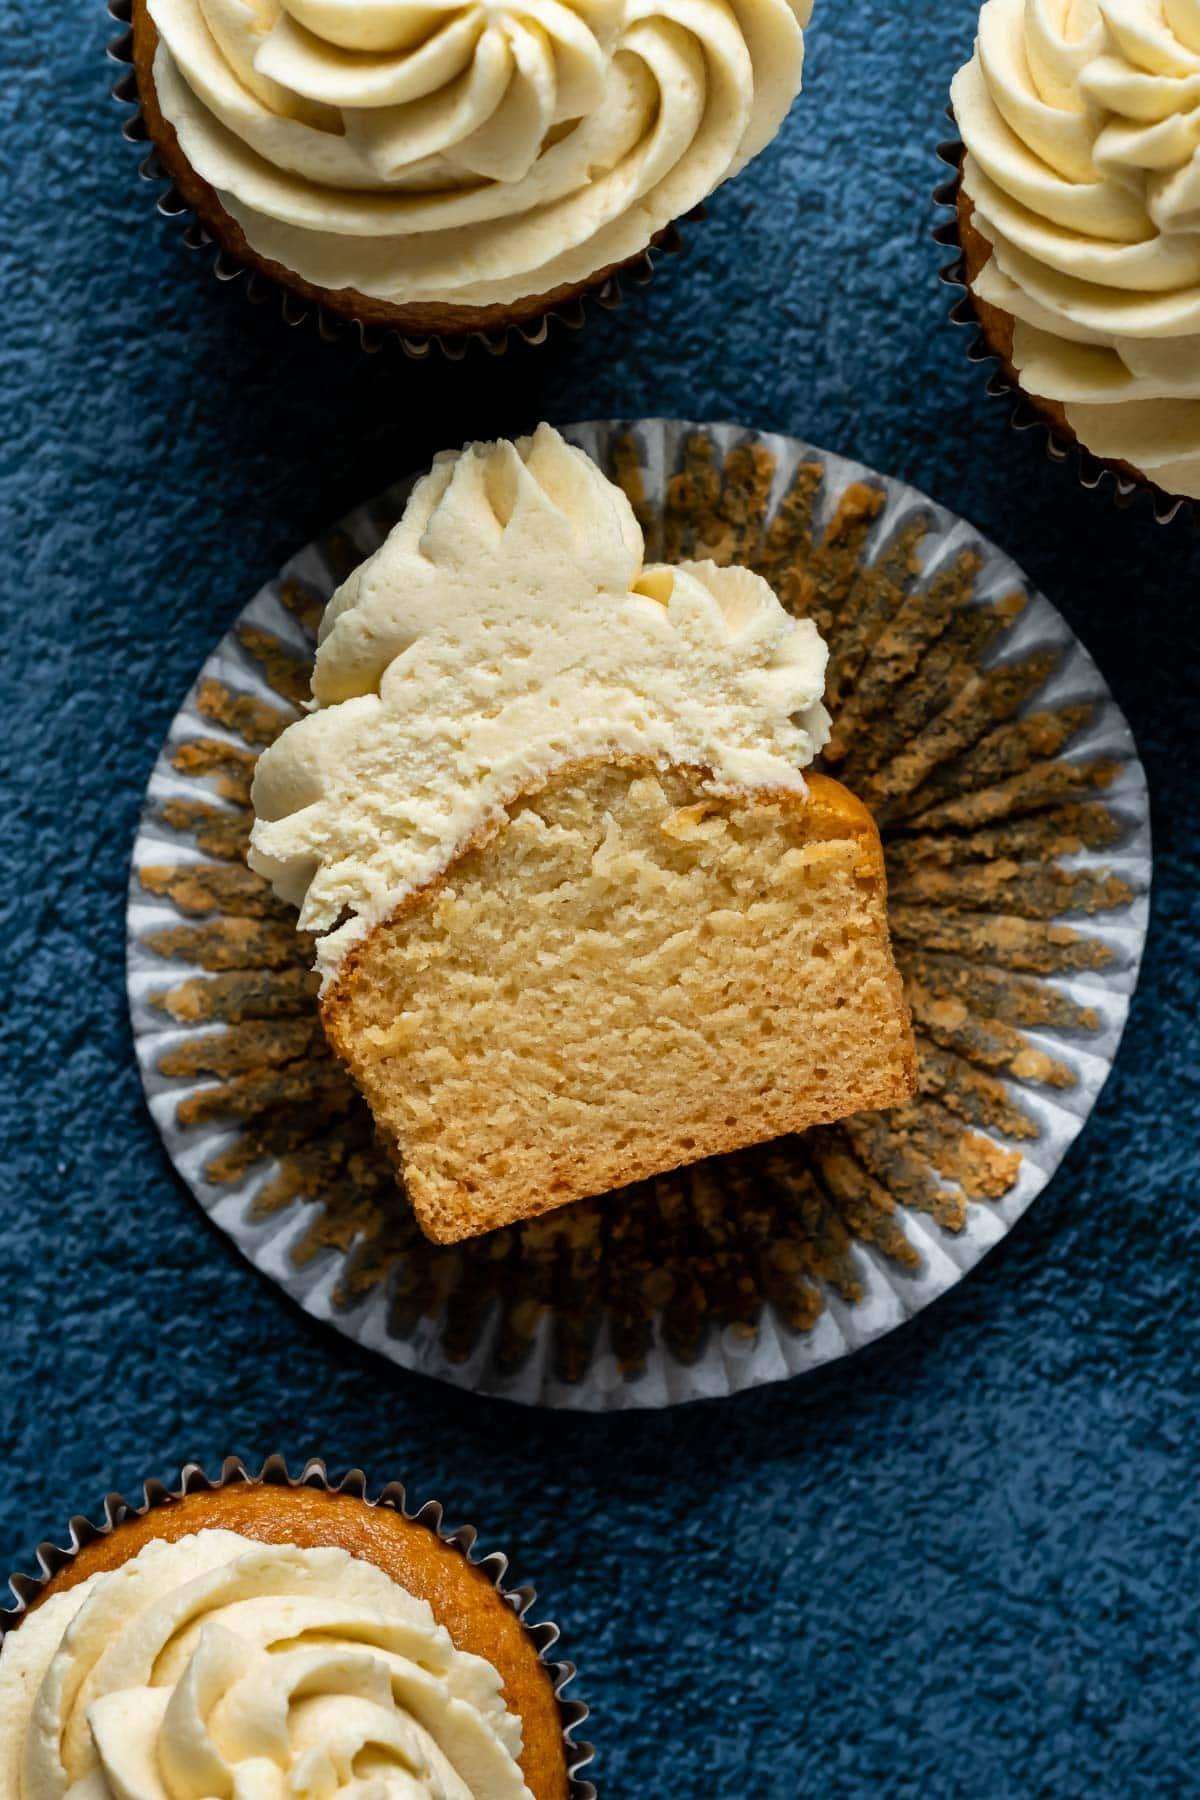 Eggless vanilla cupcake cut in half.